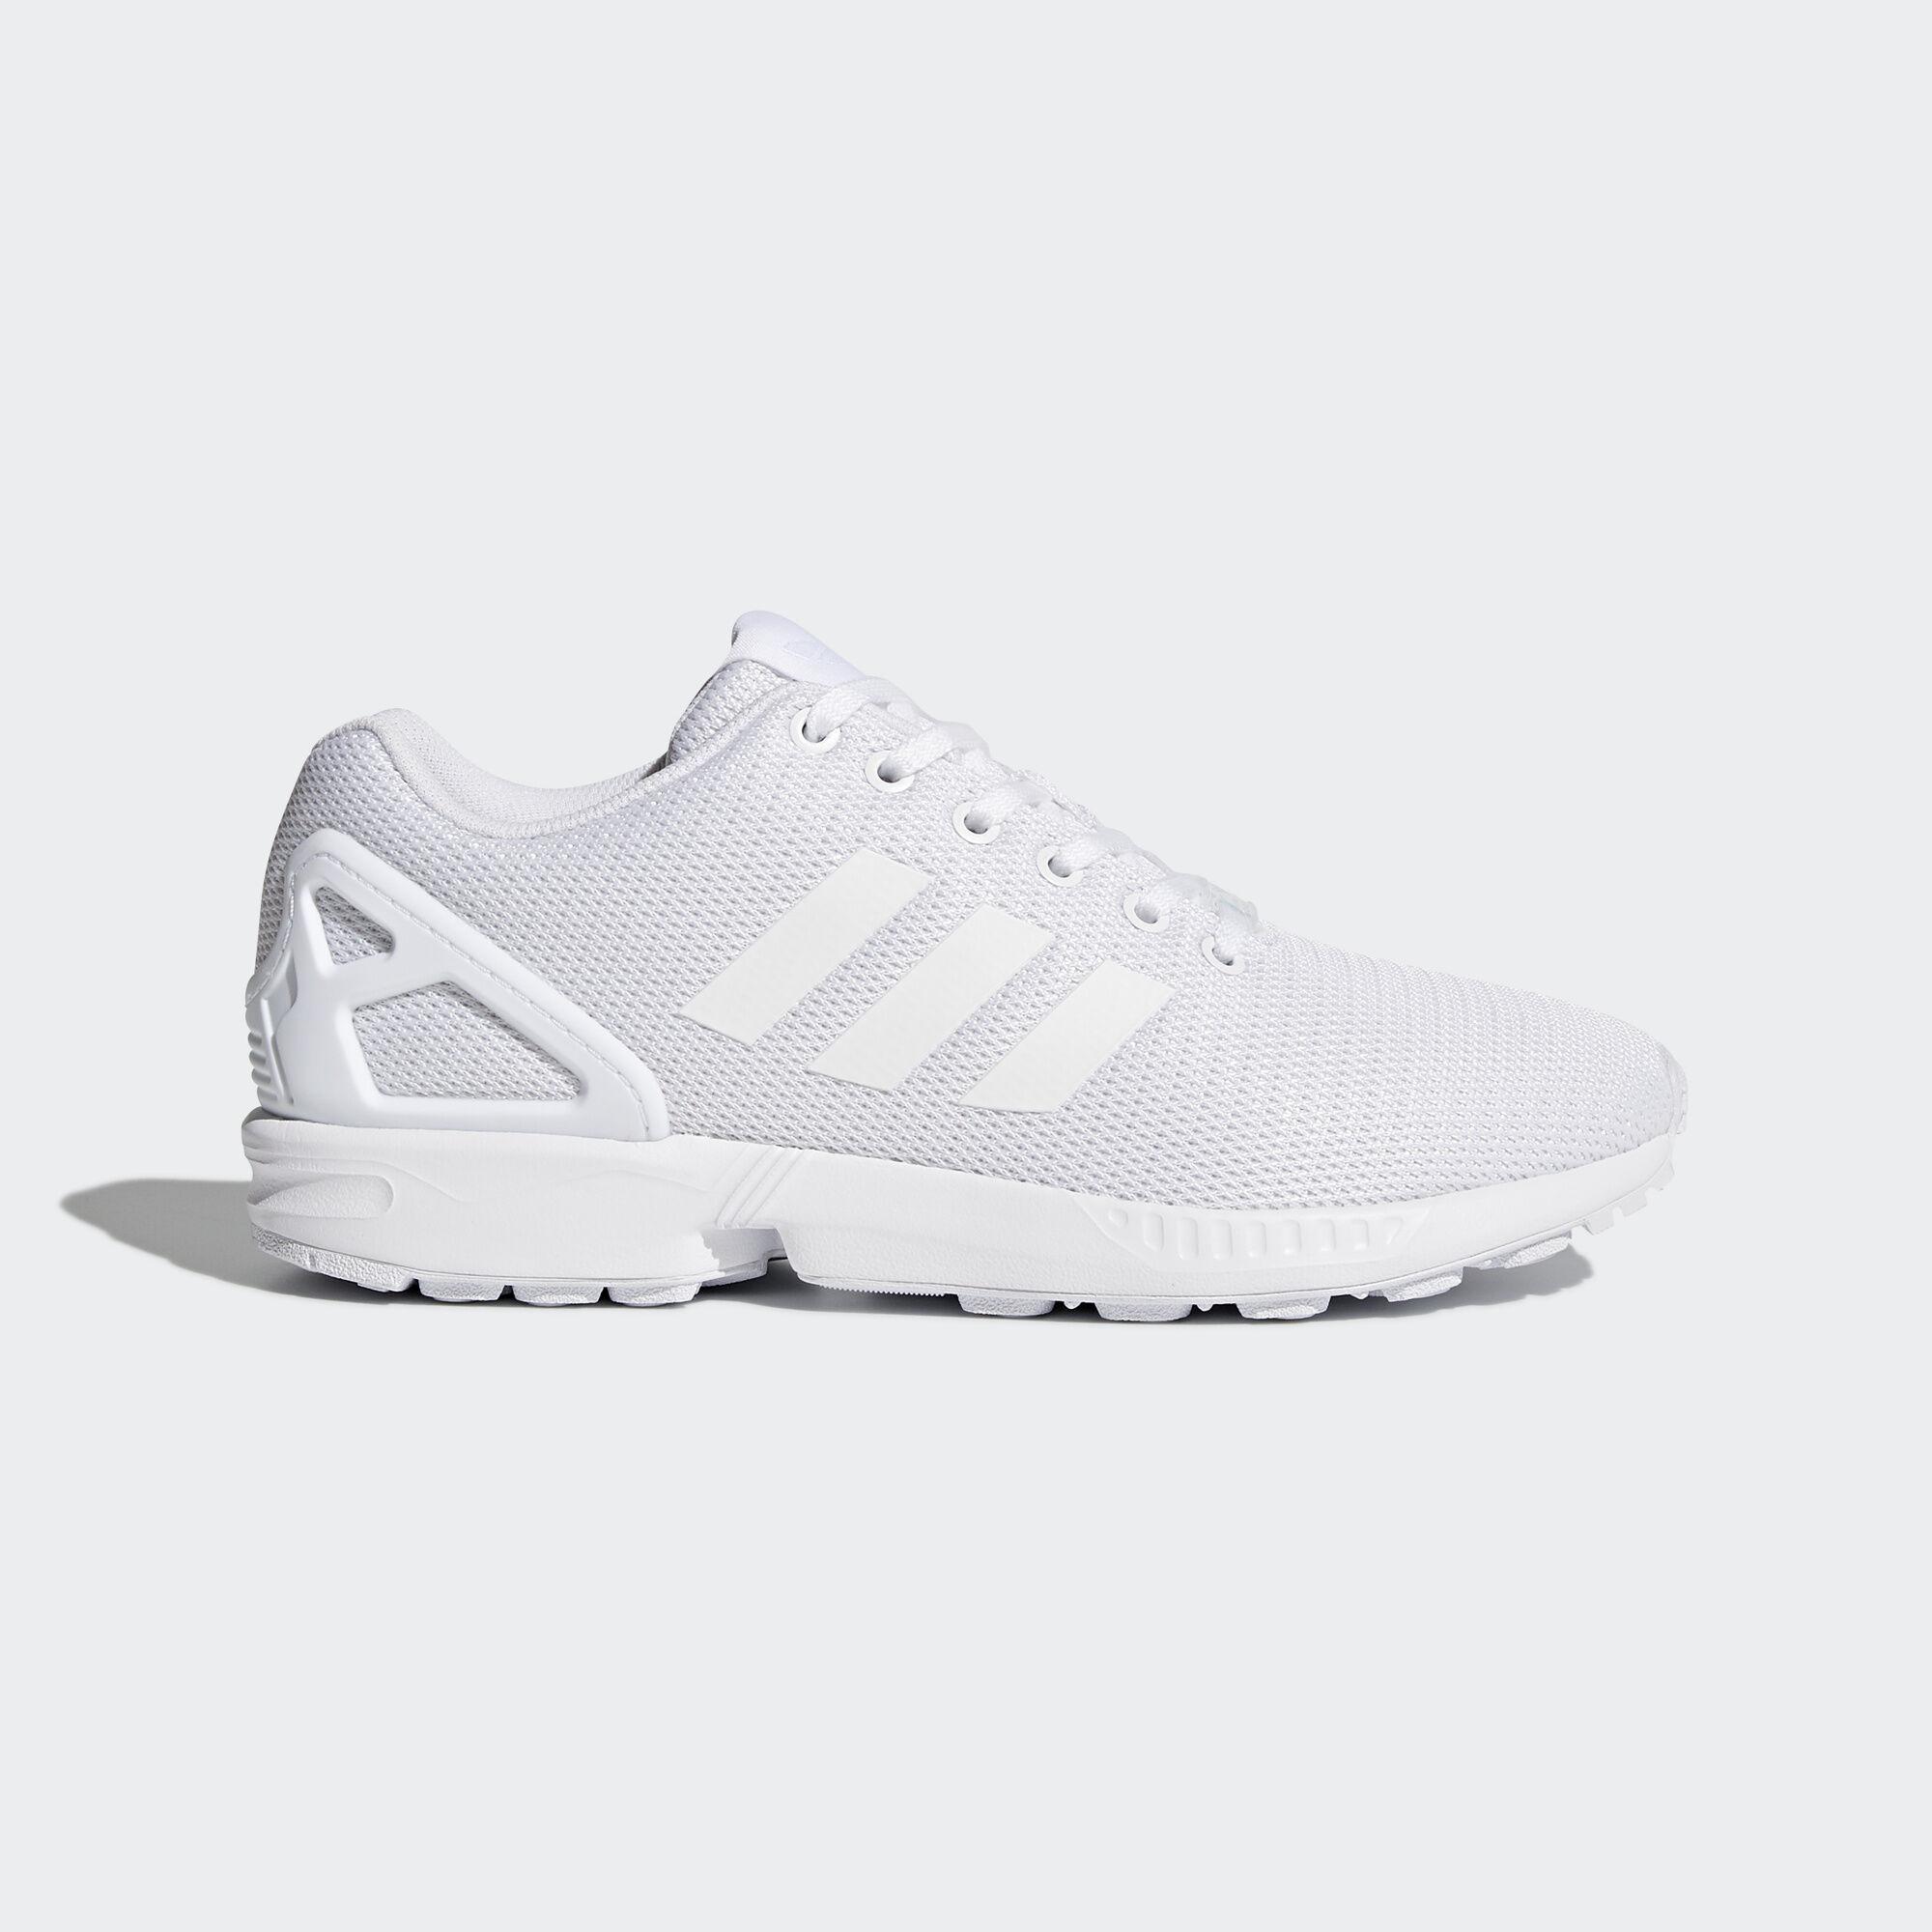 Adidas Scarpe Running Opinioni